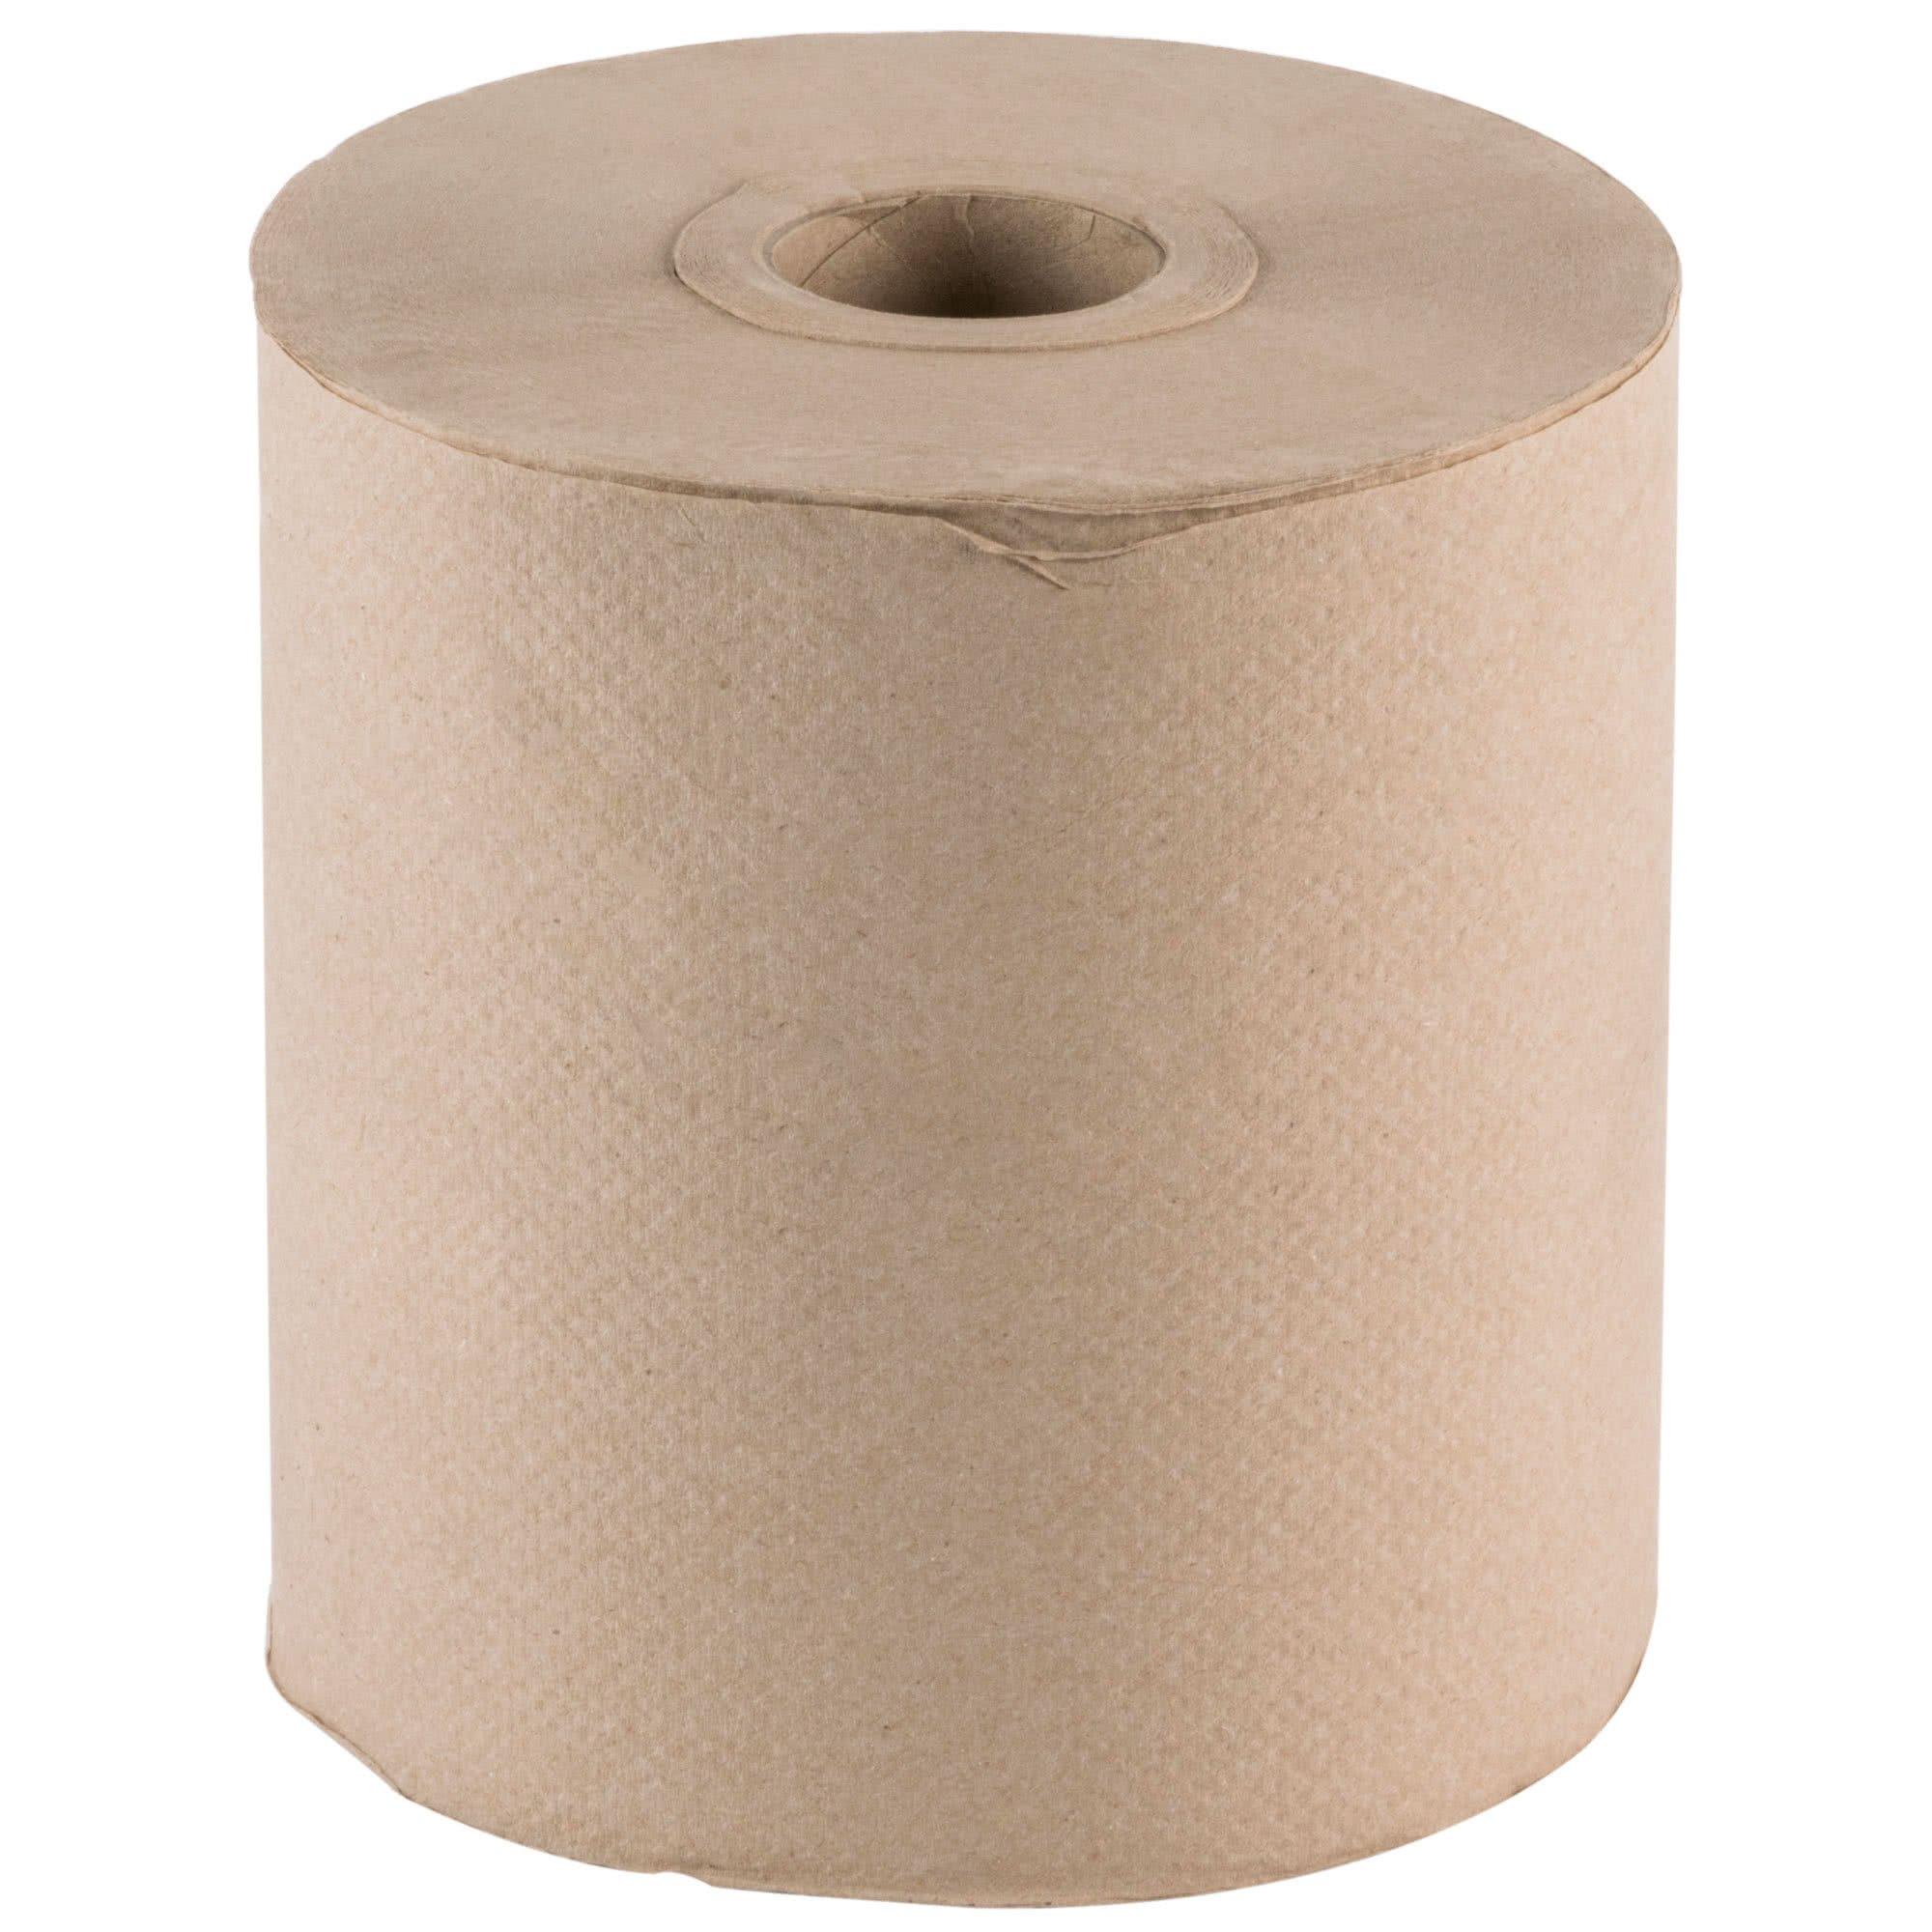 TableTop King Natural Brown Kraft Roll Towel 600 Feet / Roll - 12/Case